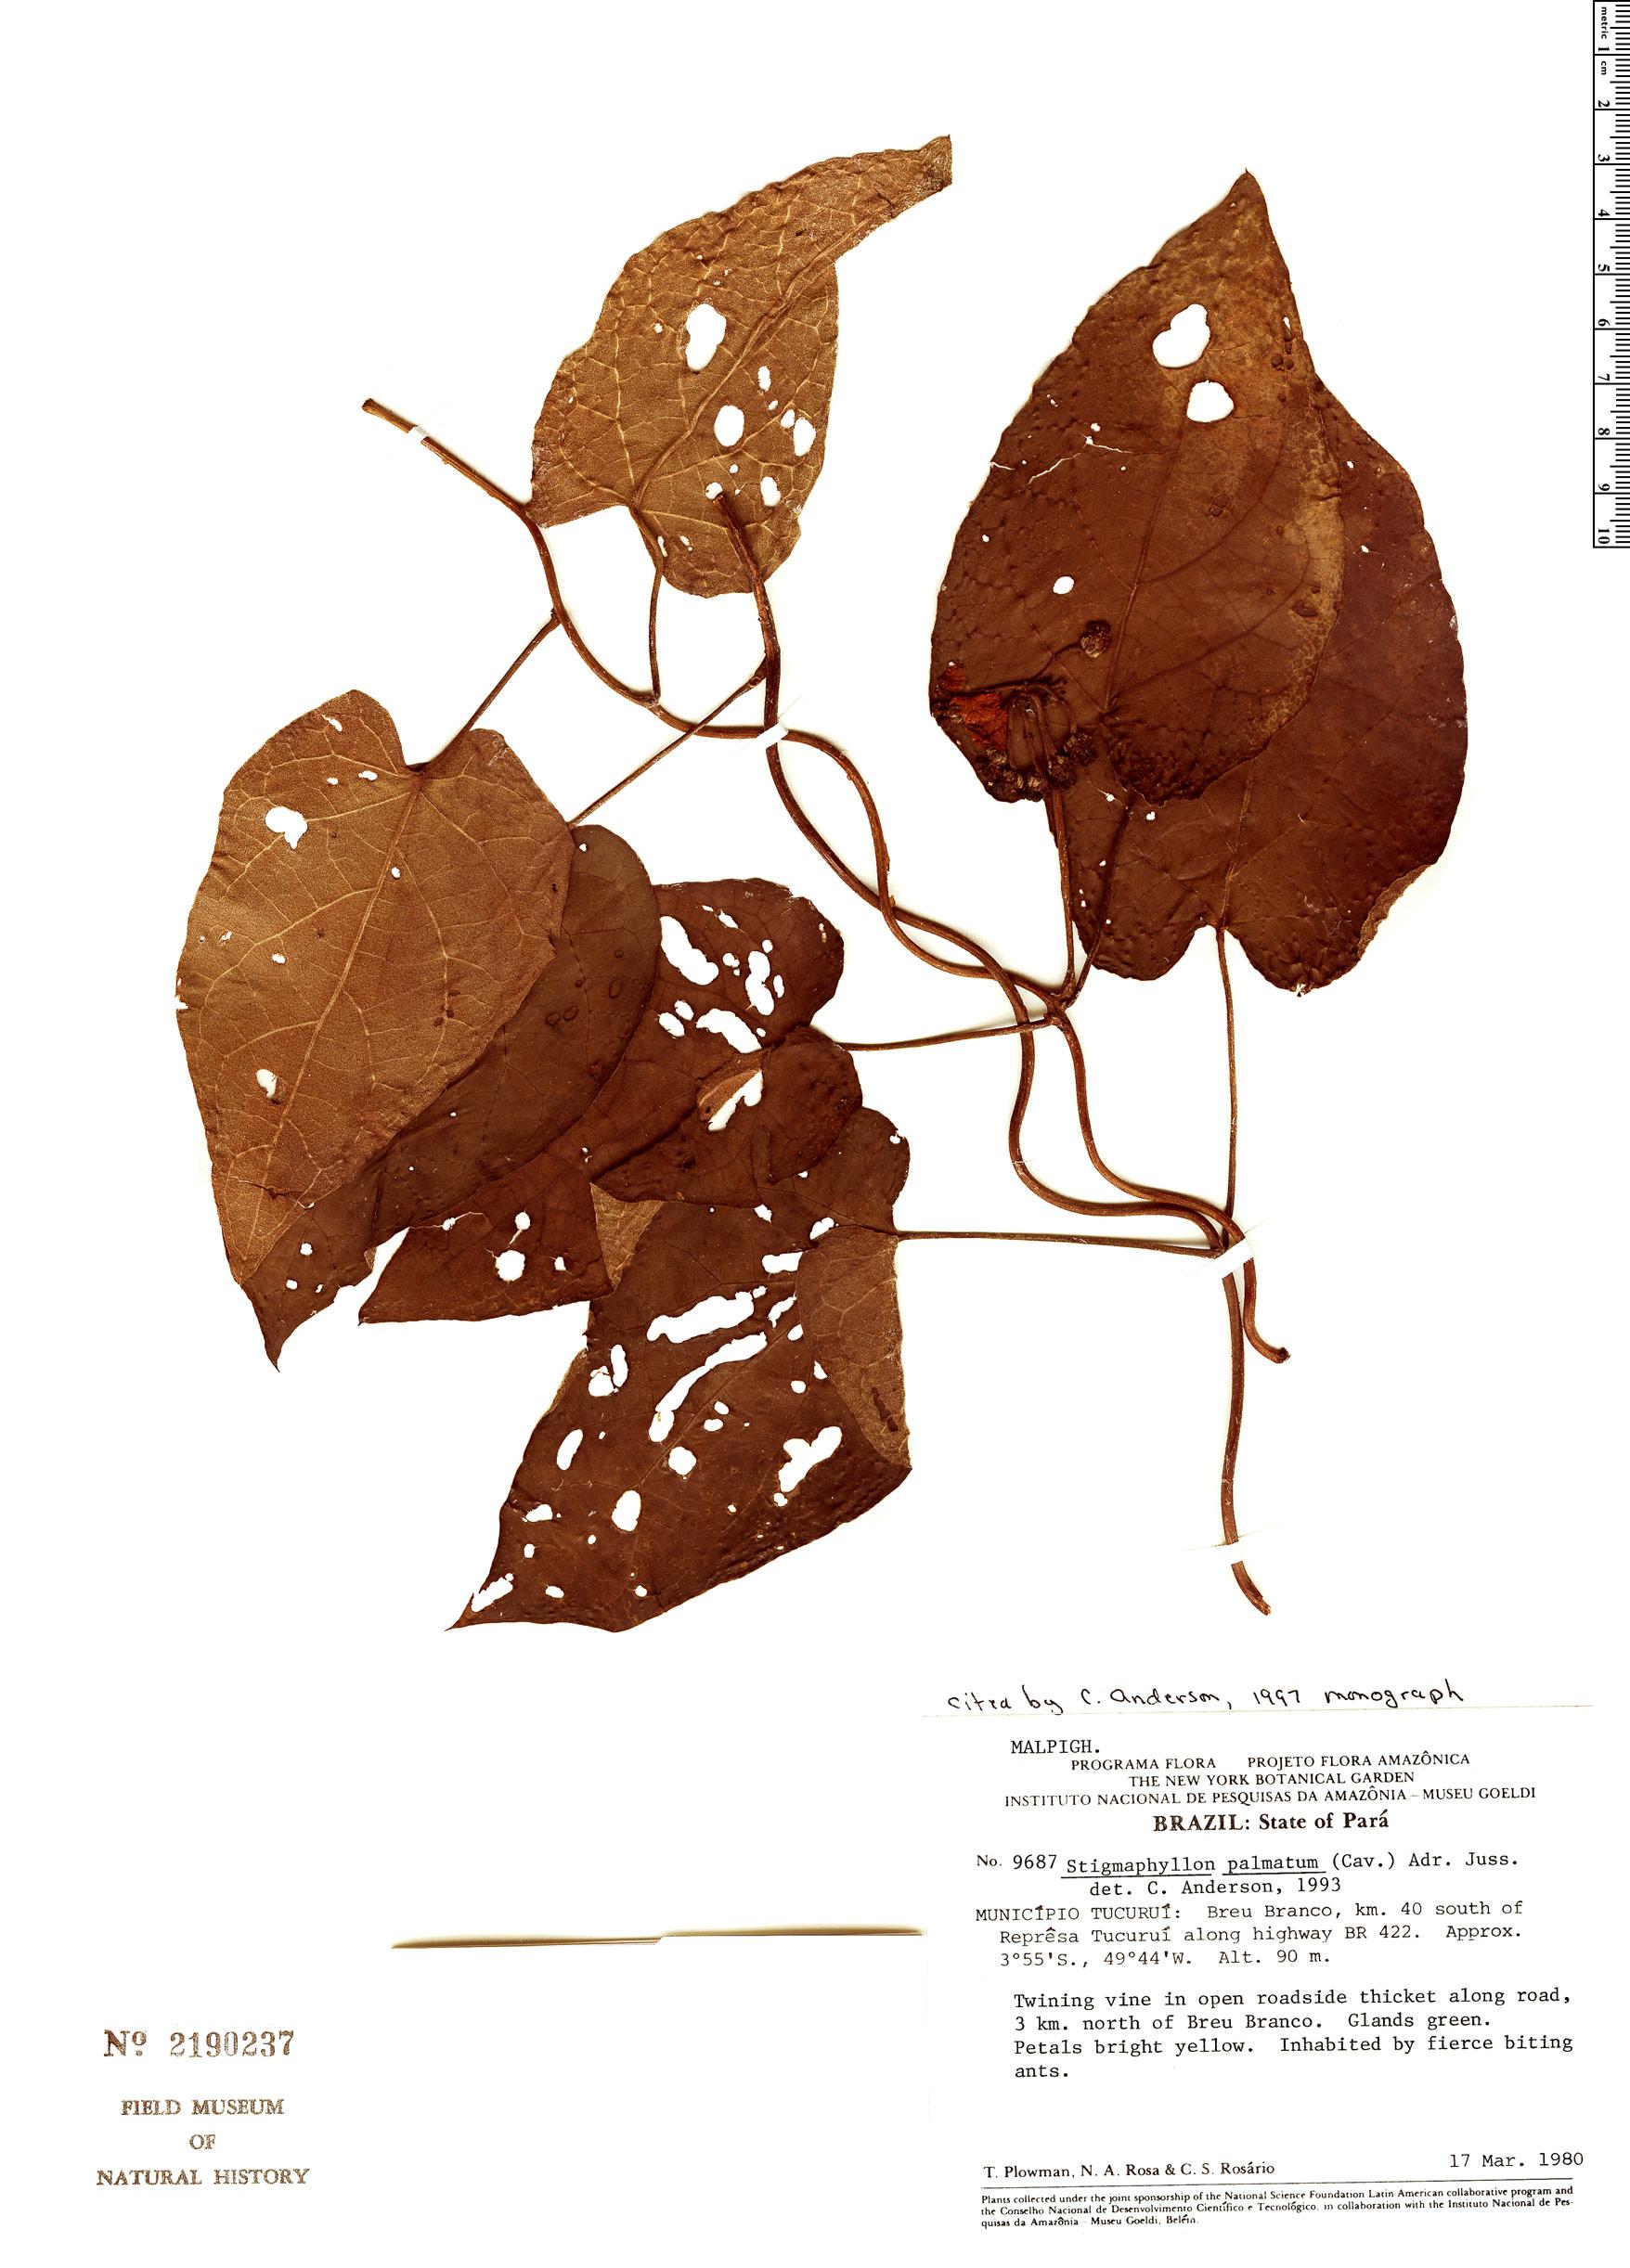 Specimen: Stigmaphyllon palmatum